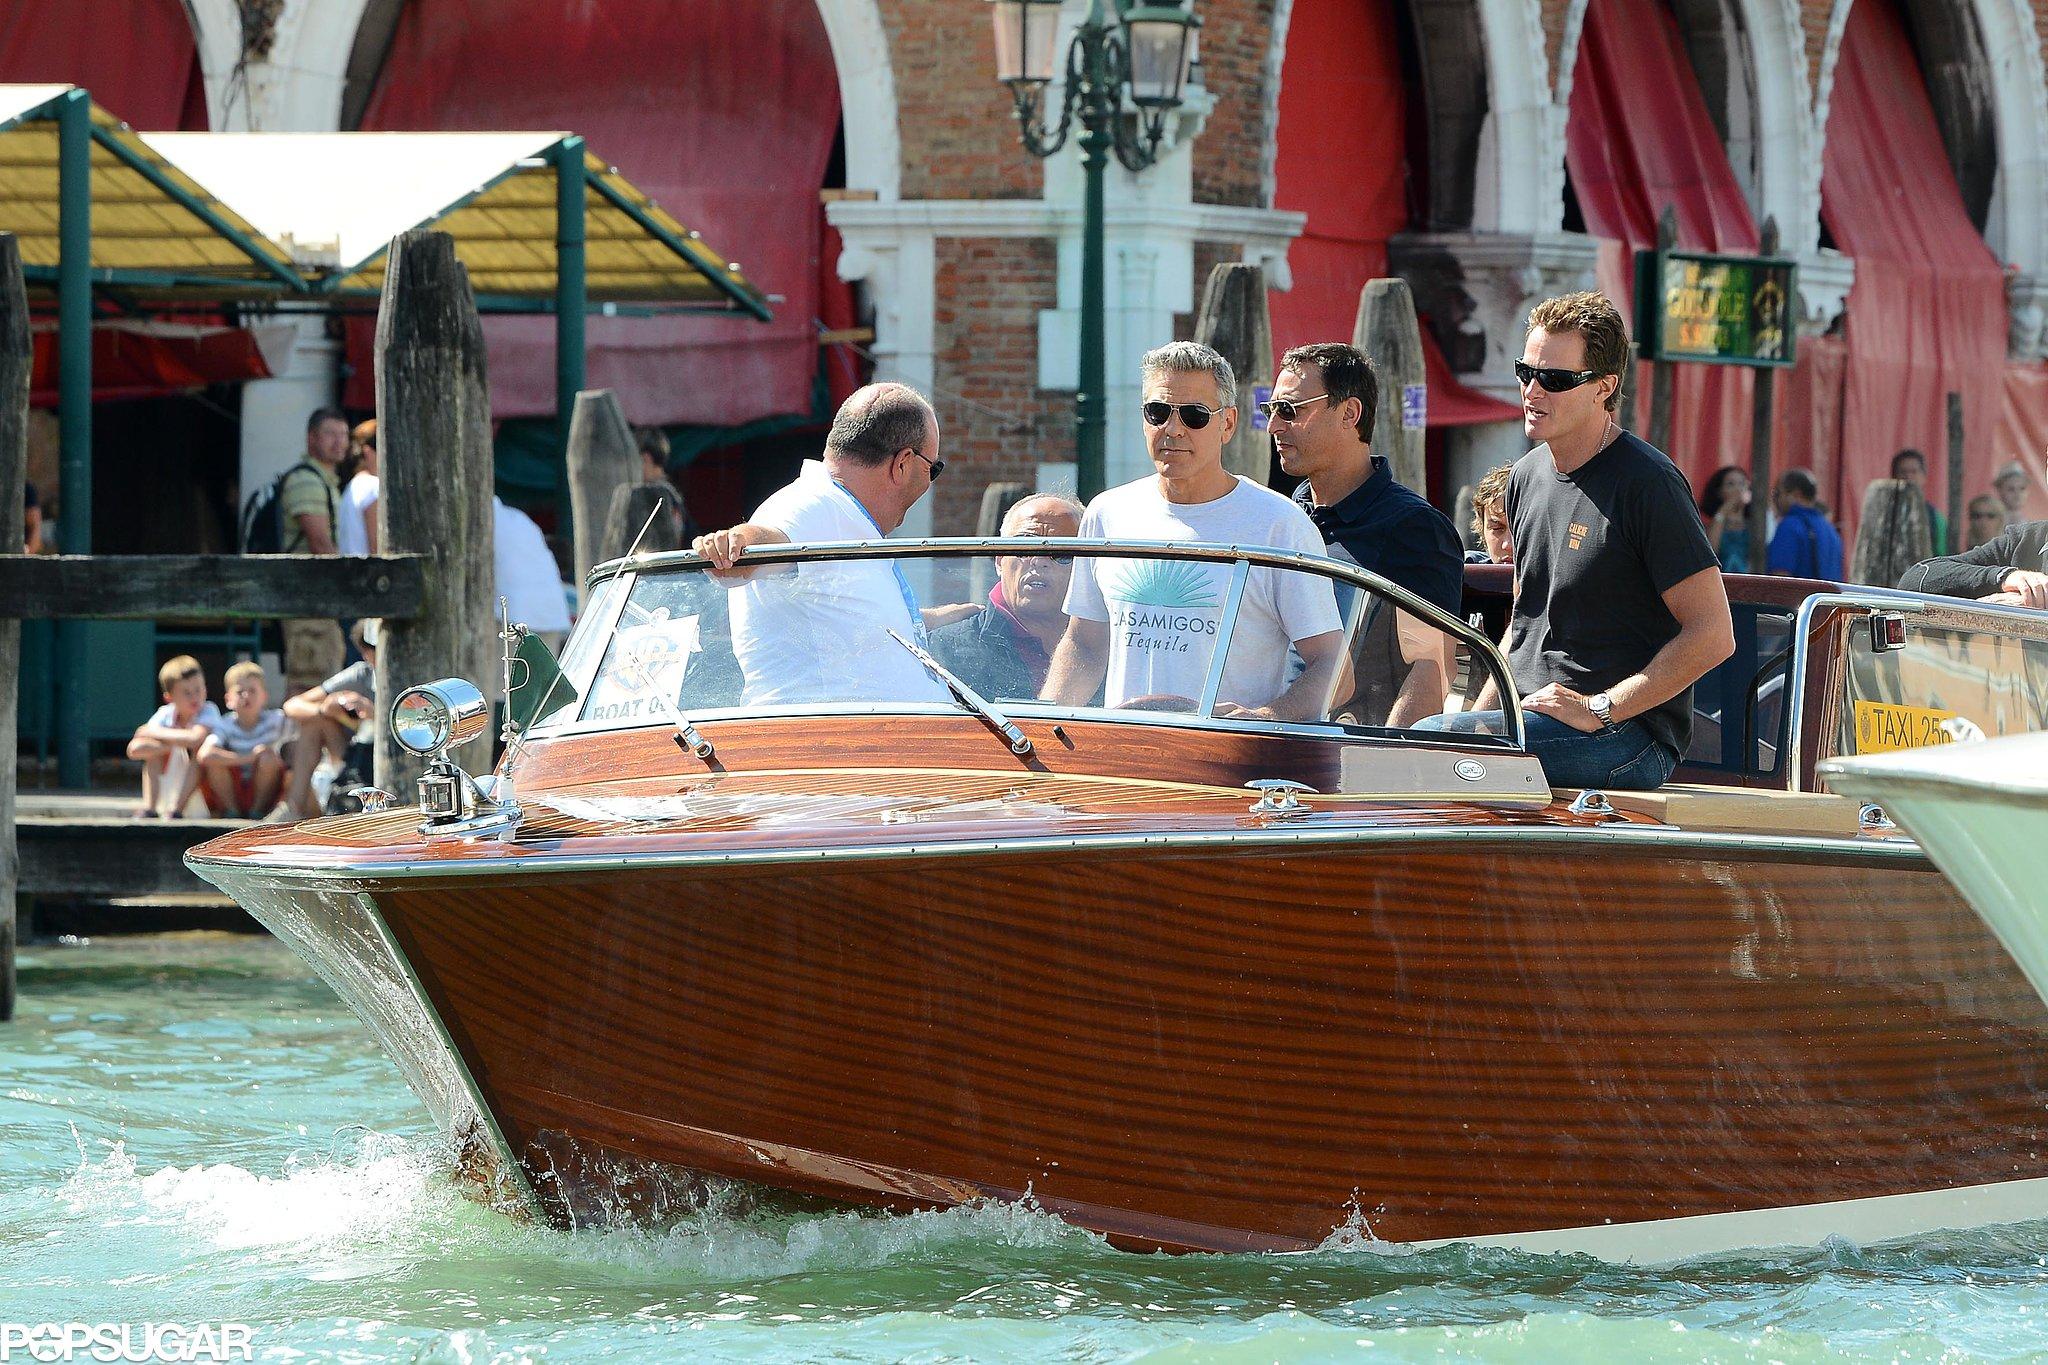 Sandra Bullock and George Clooney Cruise Into Venice